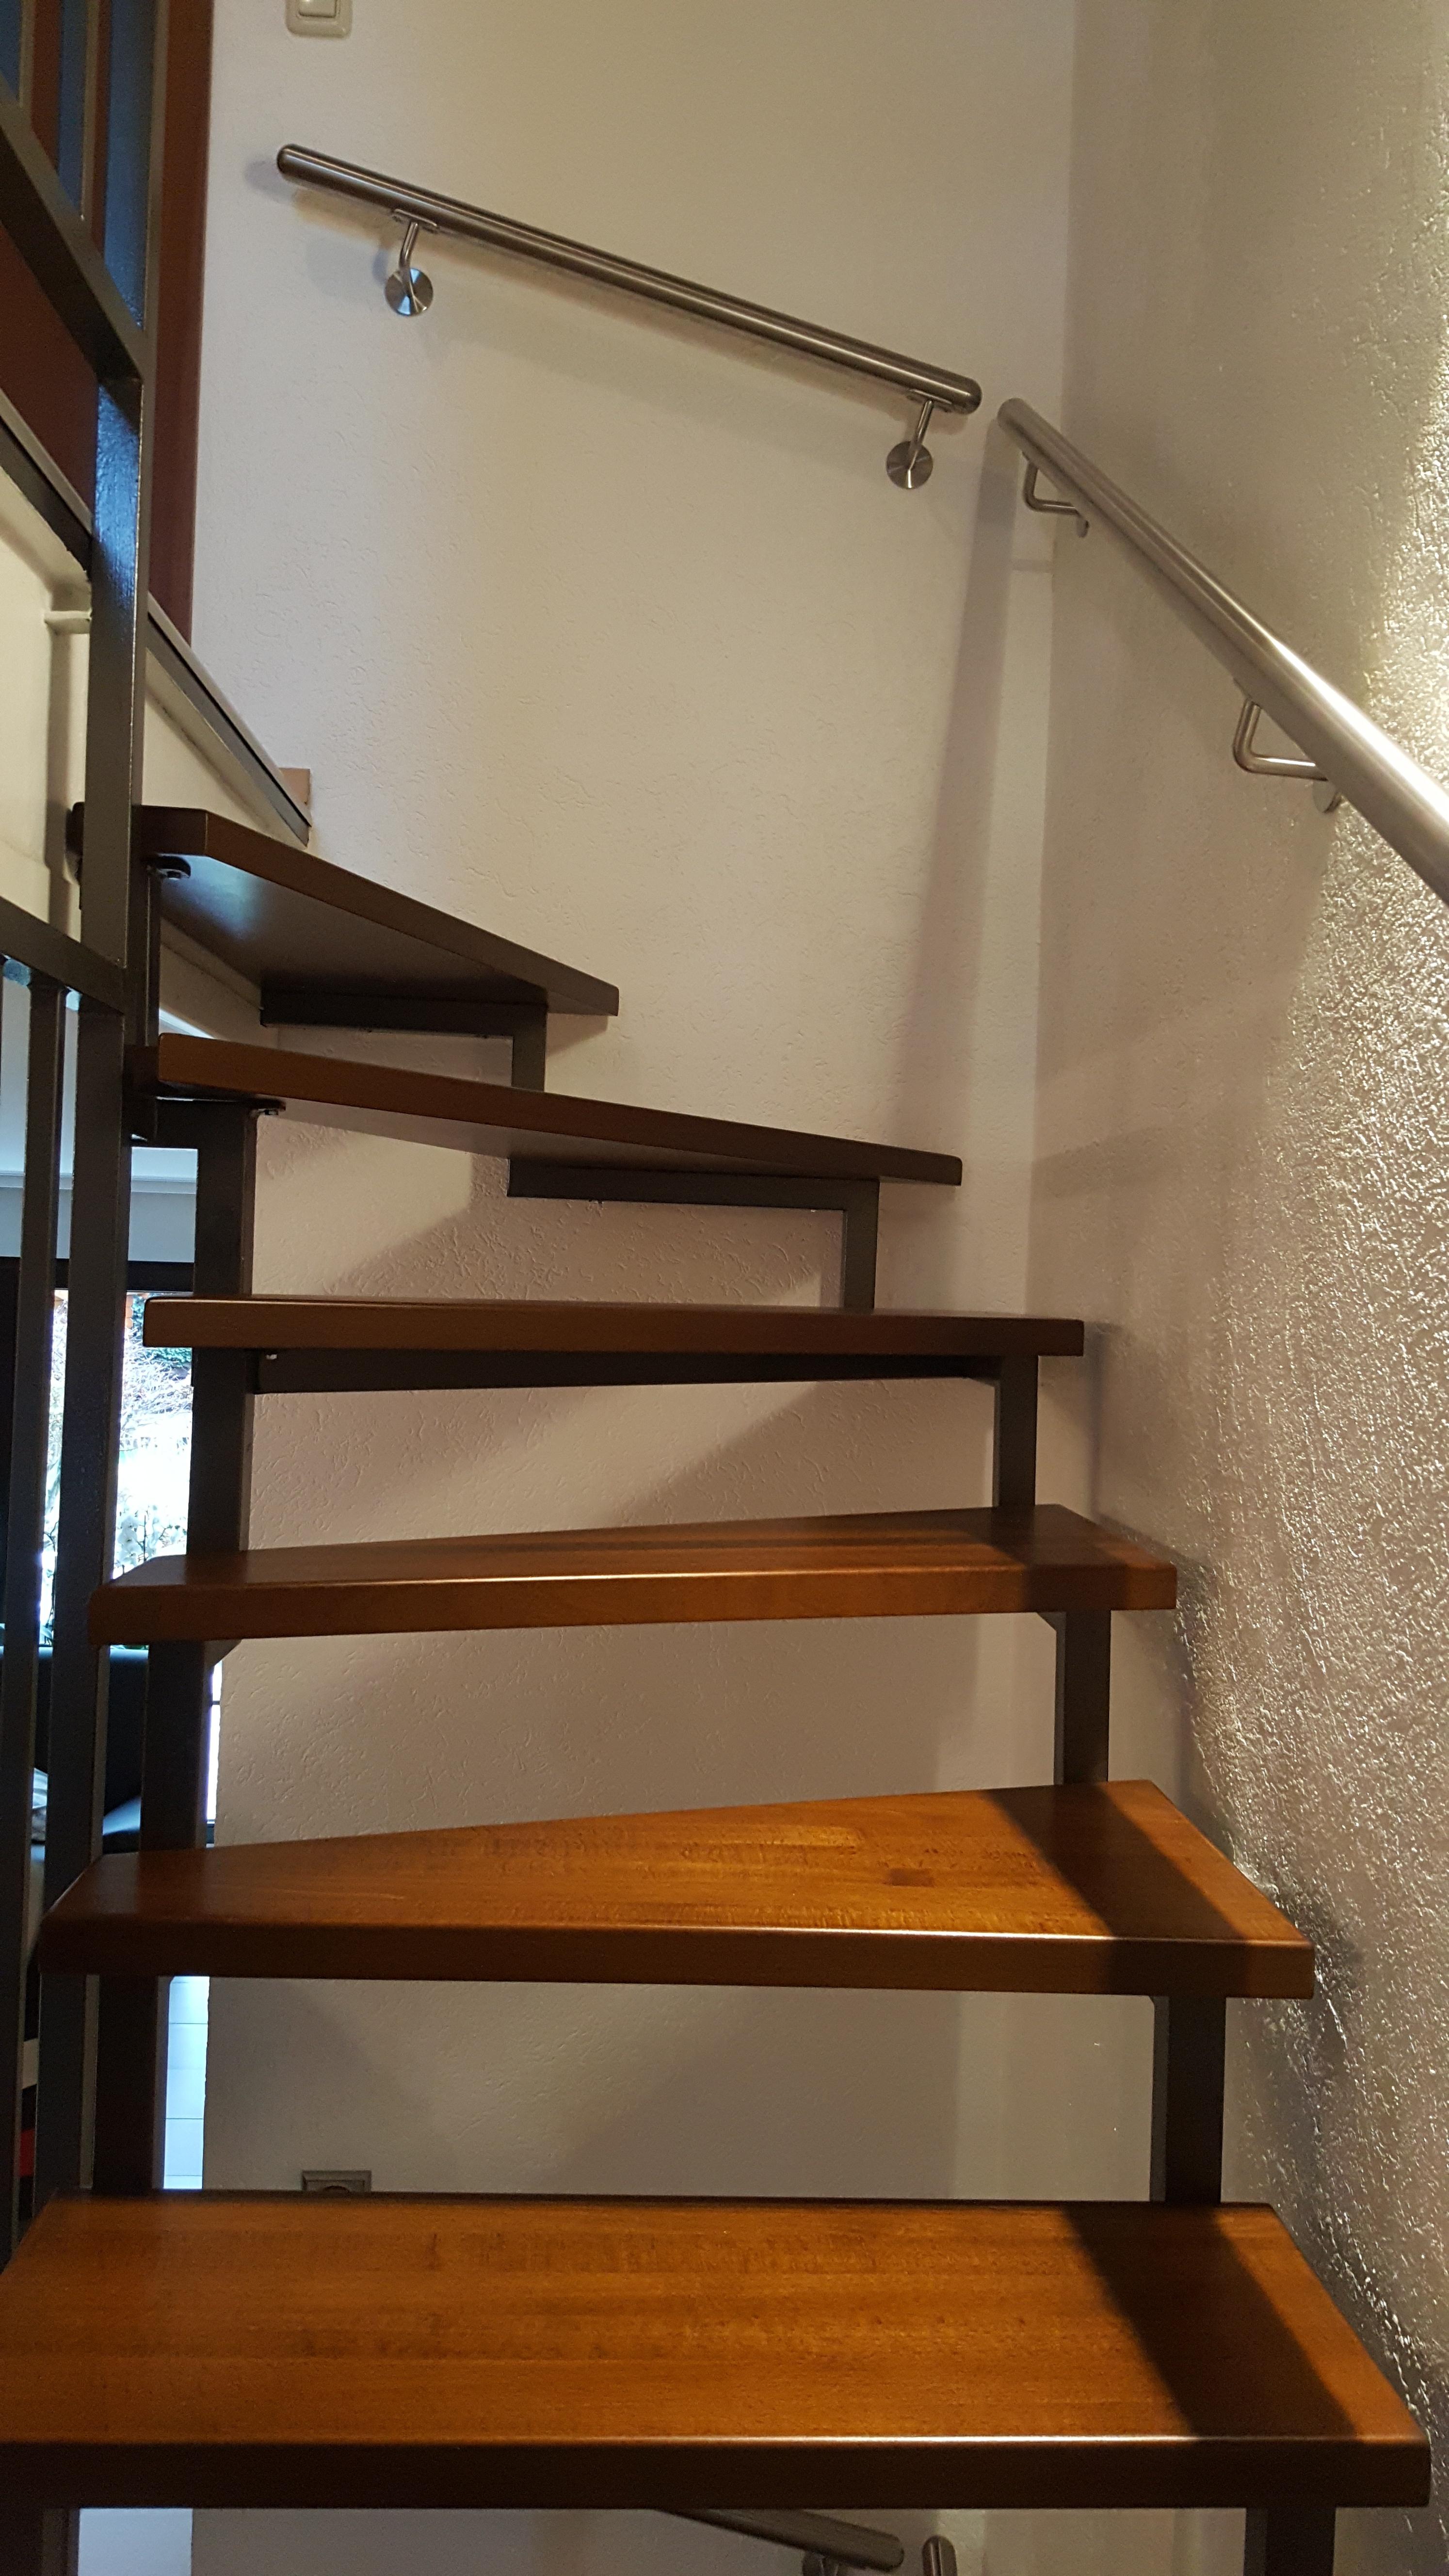 massivholzstufen auf einer stahlkonstruktionstreppe jowi. Black Bedroom Furniture Sets. Home Design Ideas